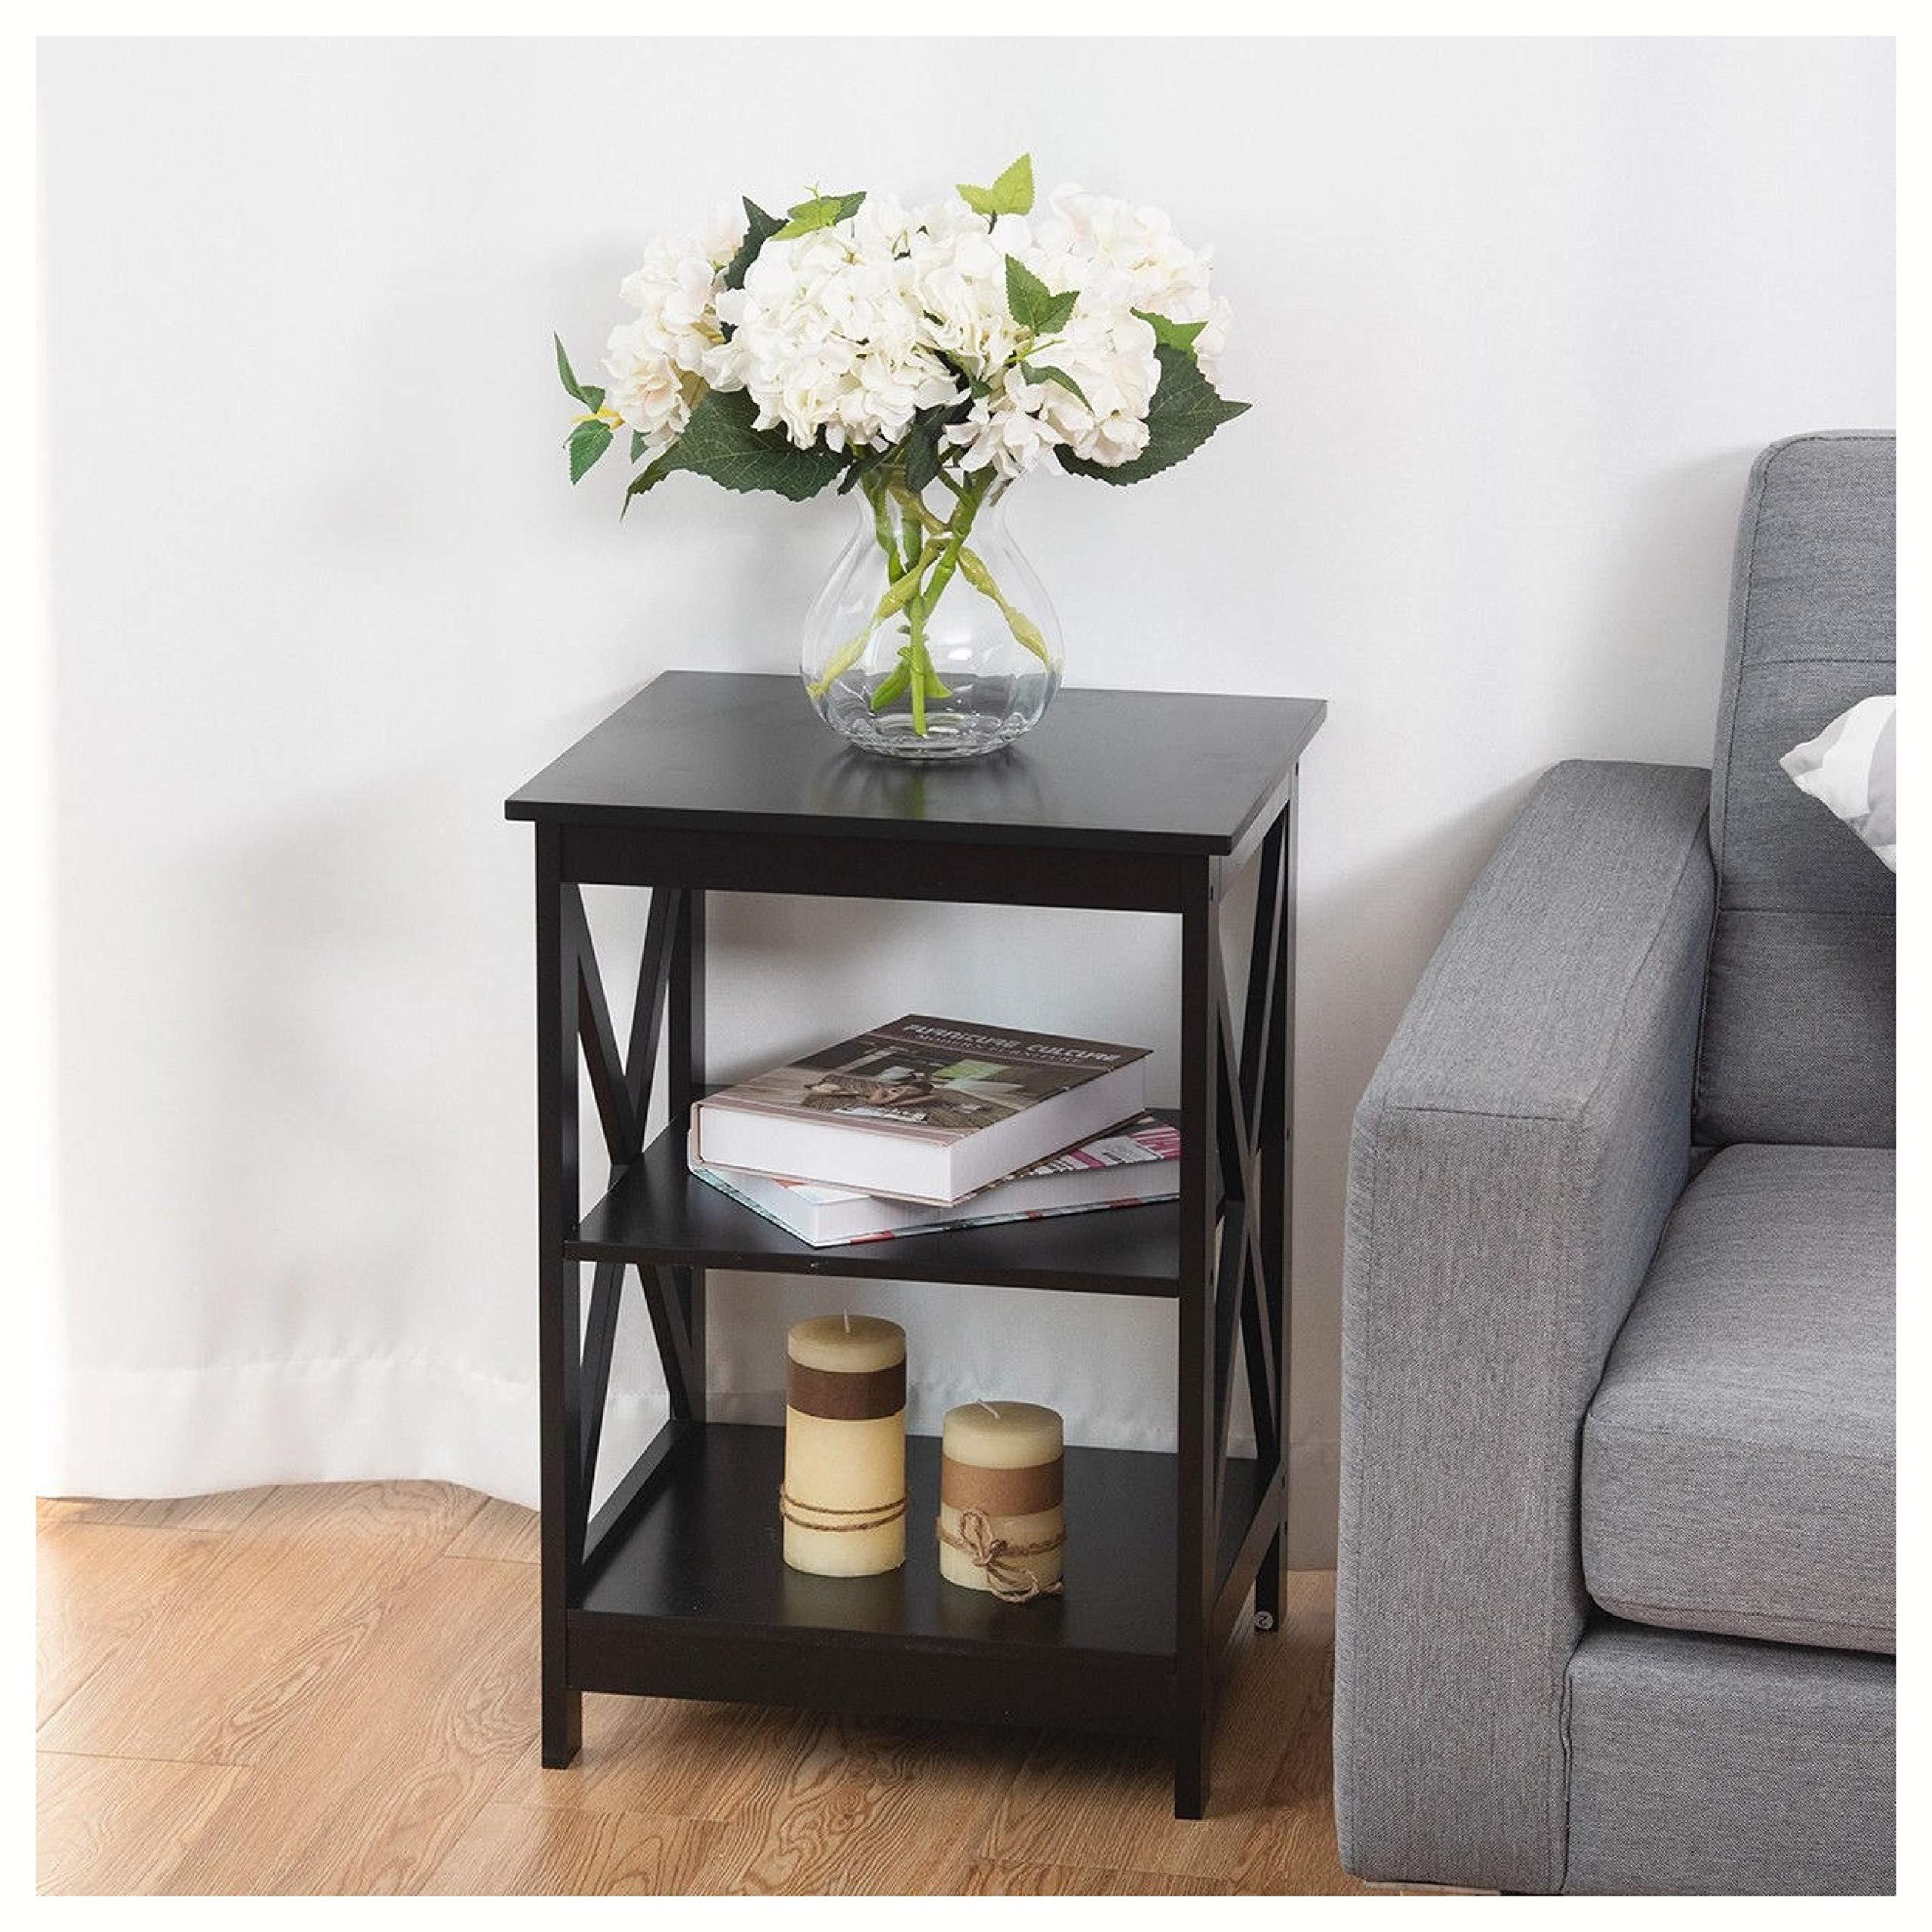 End Table, 3-Tier Living Room Display Storage Shelf Nightstand, Black